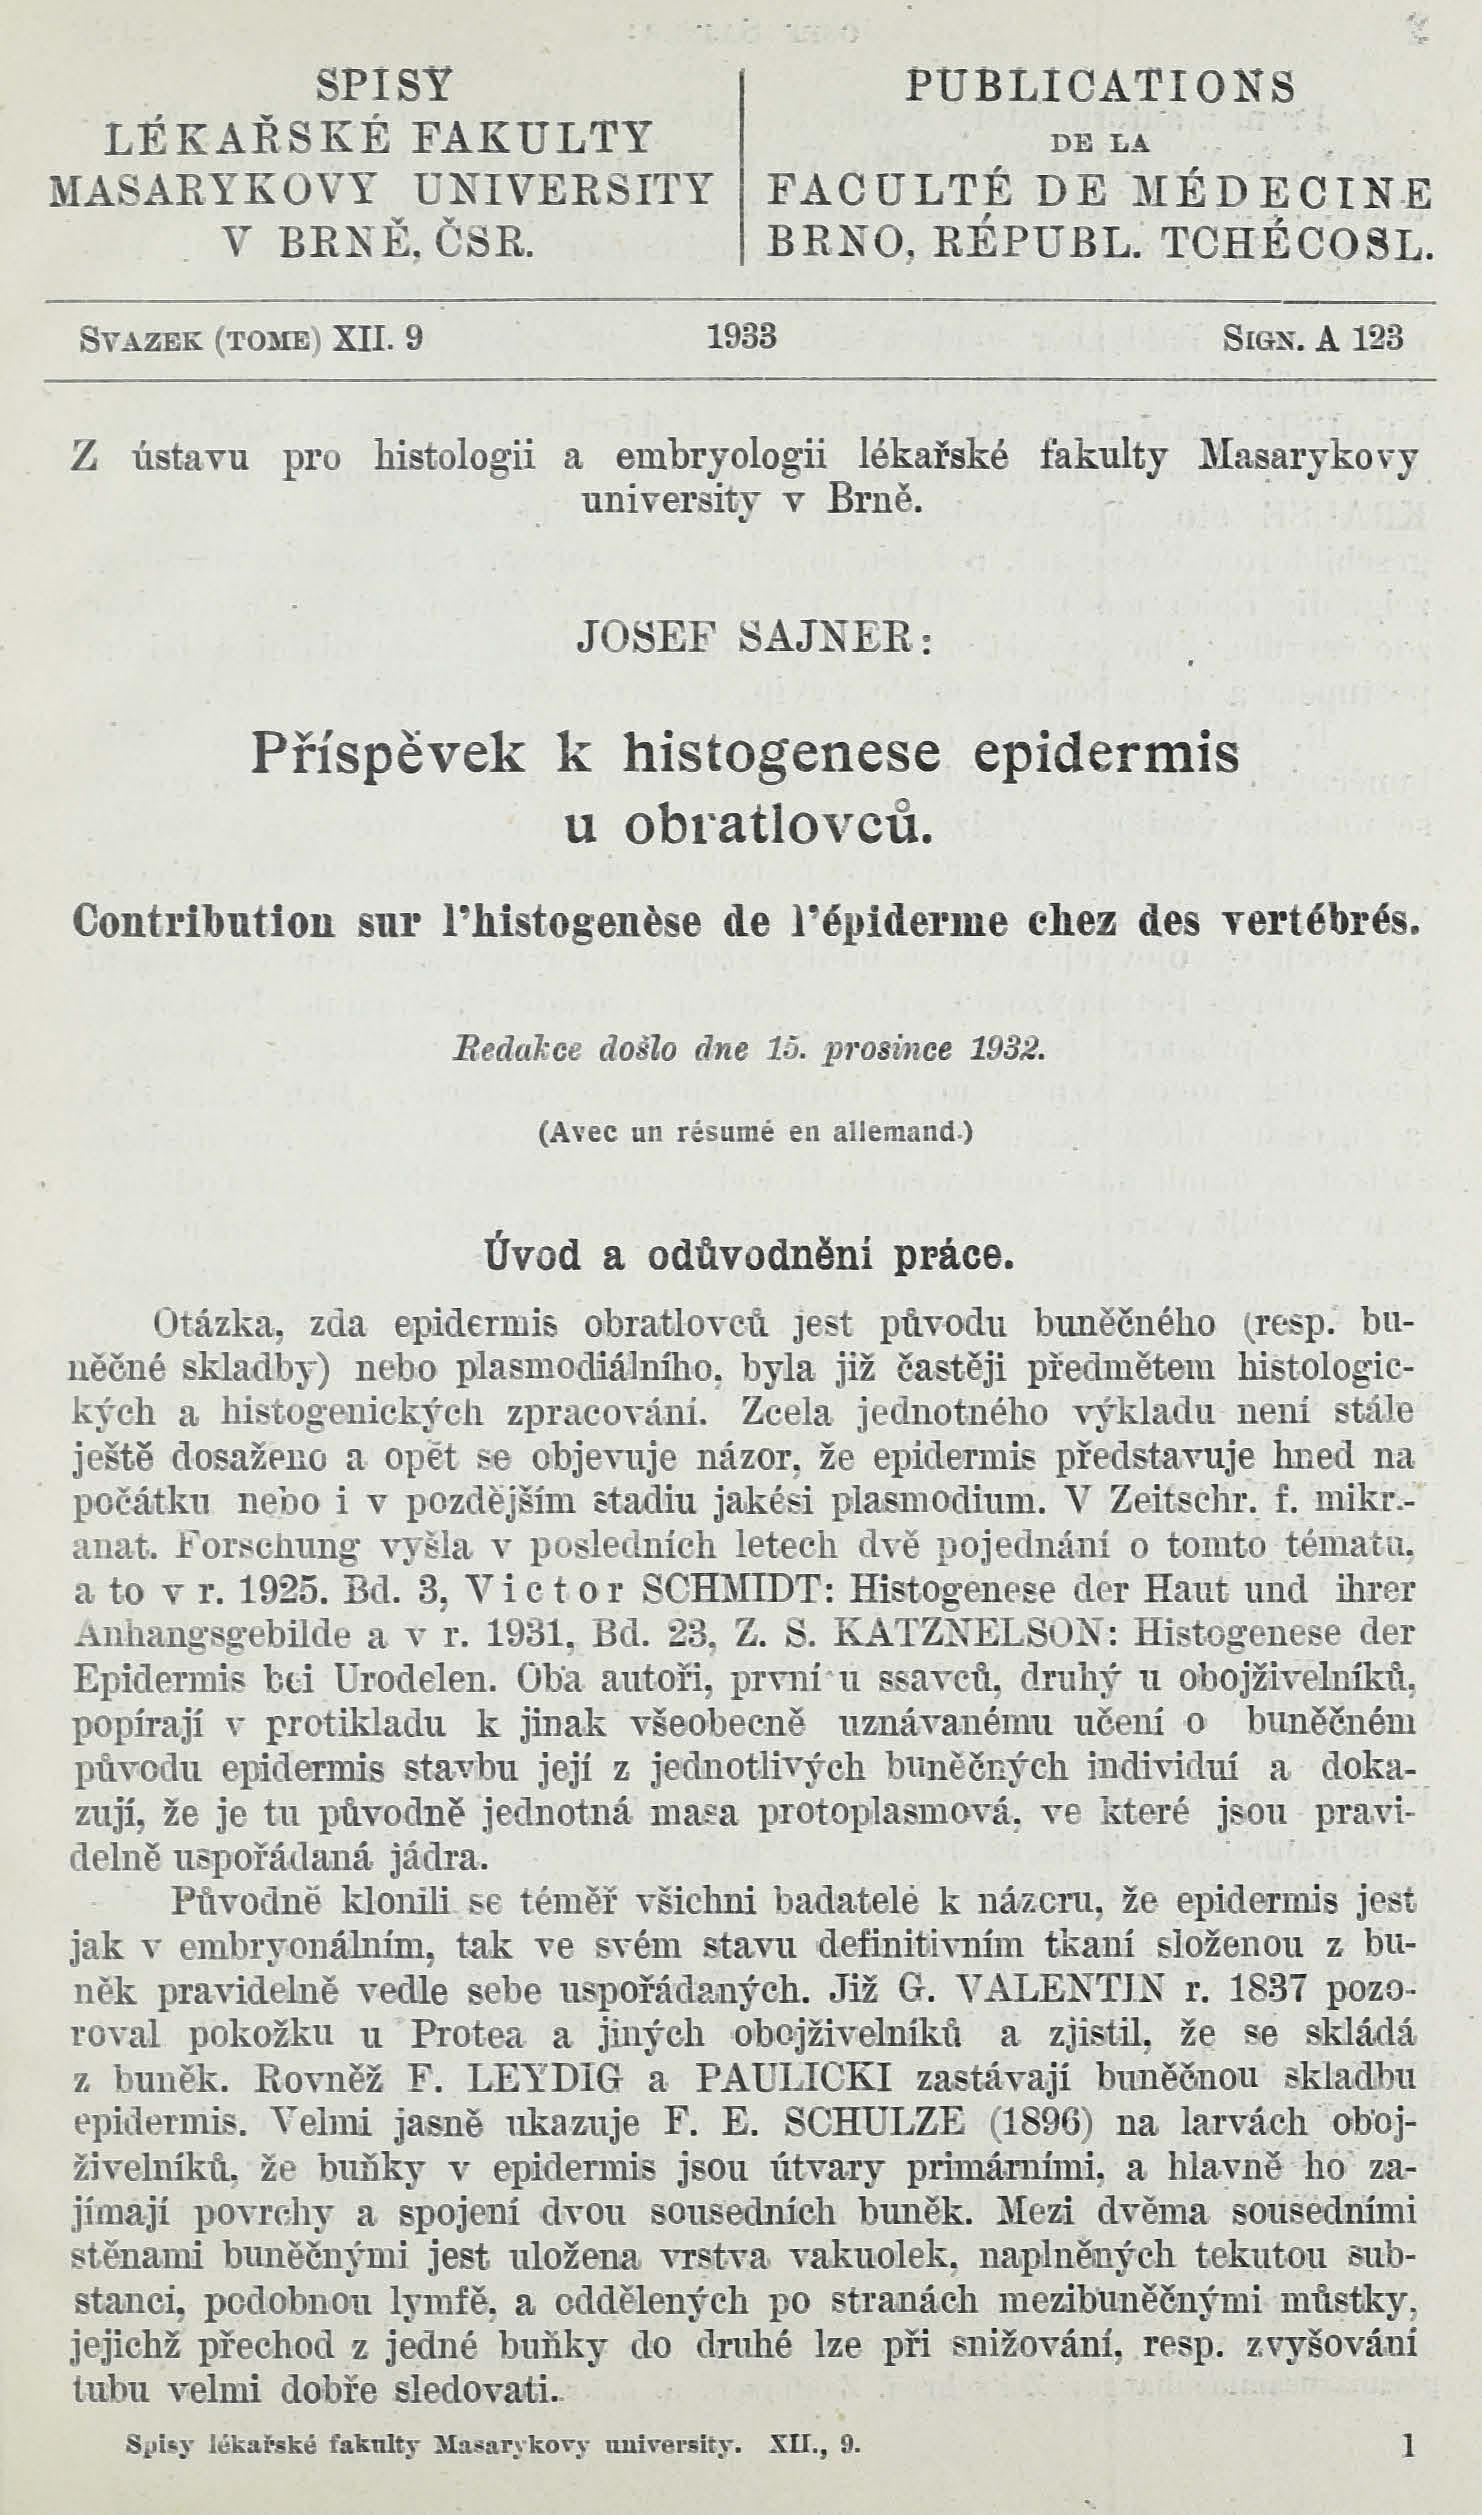 Obálka pro Příspěvek k histogenese epidermis u obratlovců / Contribution sur l'histogenèse de l'épiderme chez des vertébrés